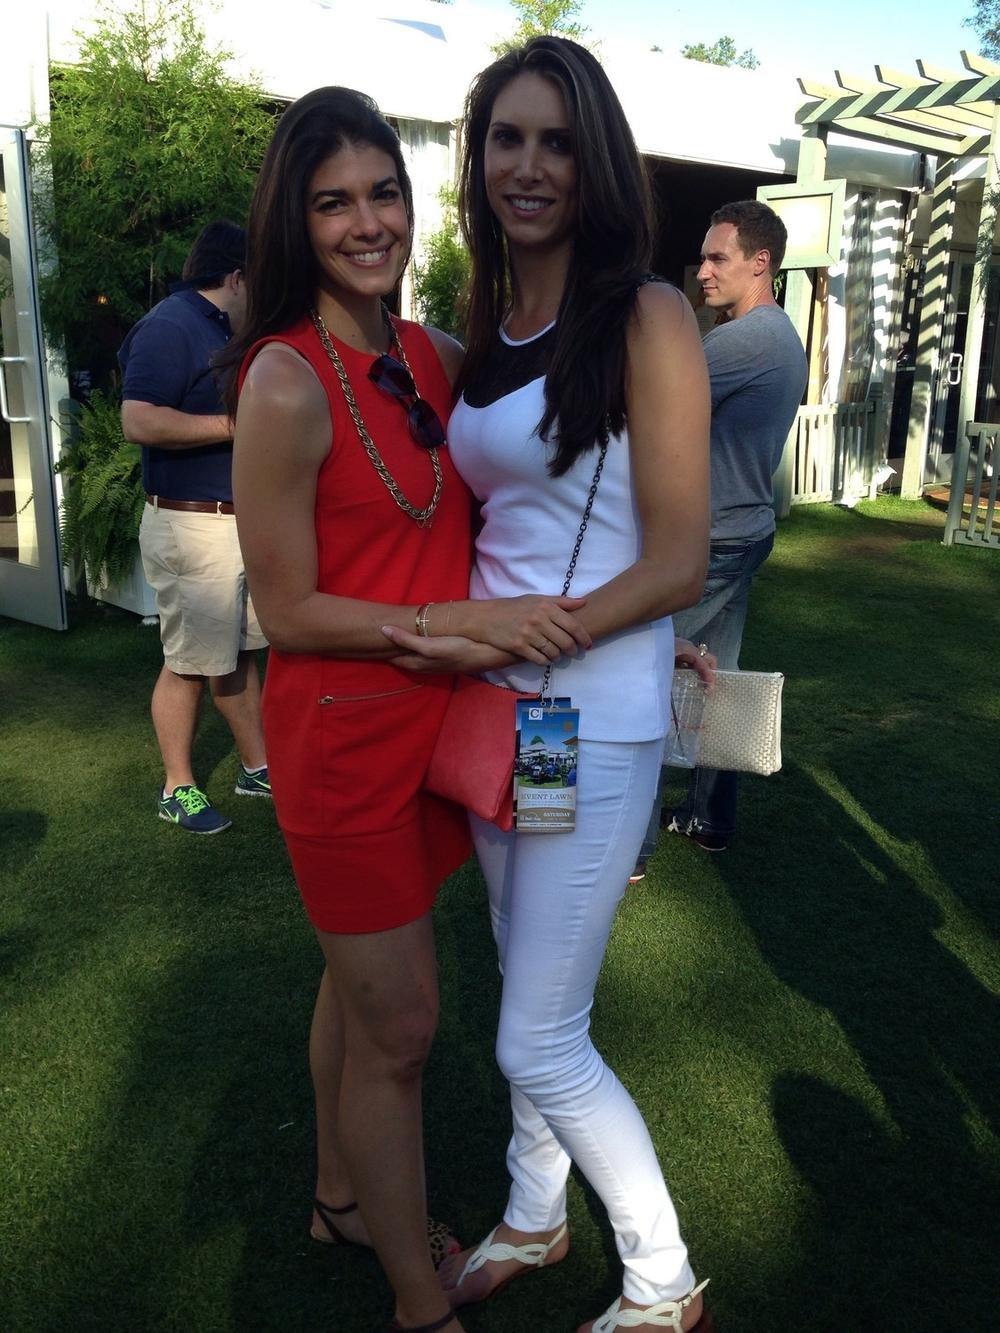 LS & MG - golf tourney 2014